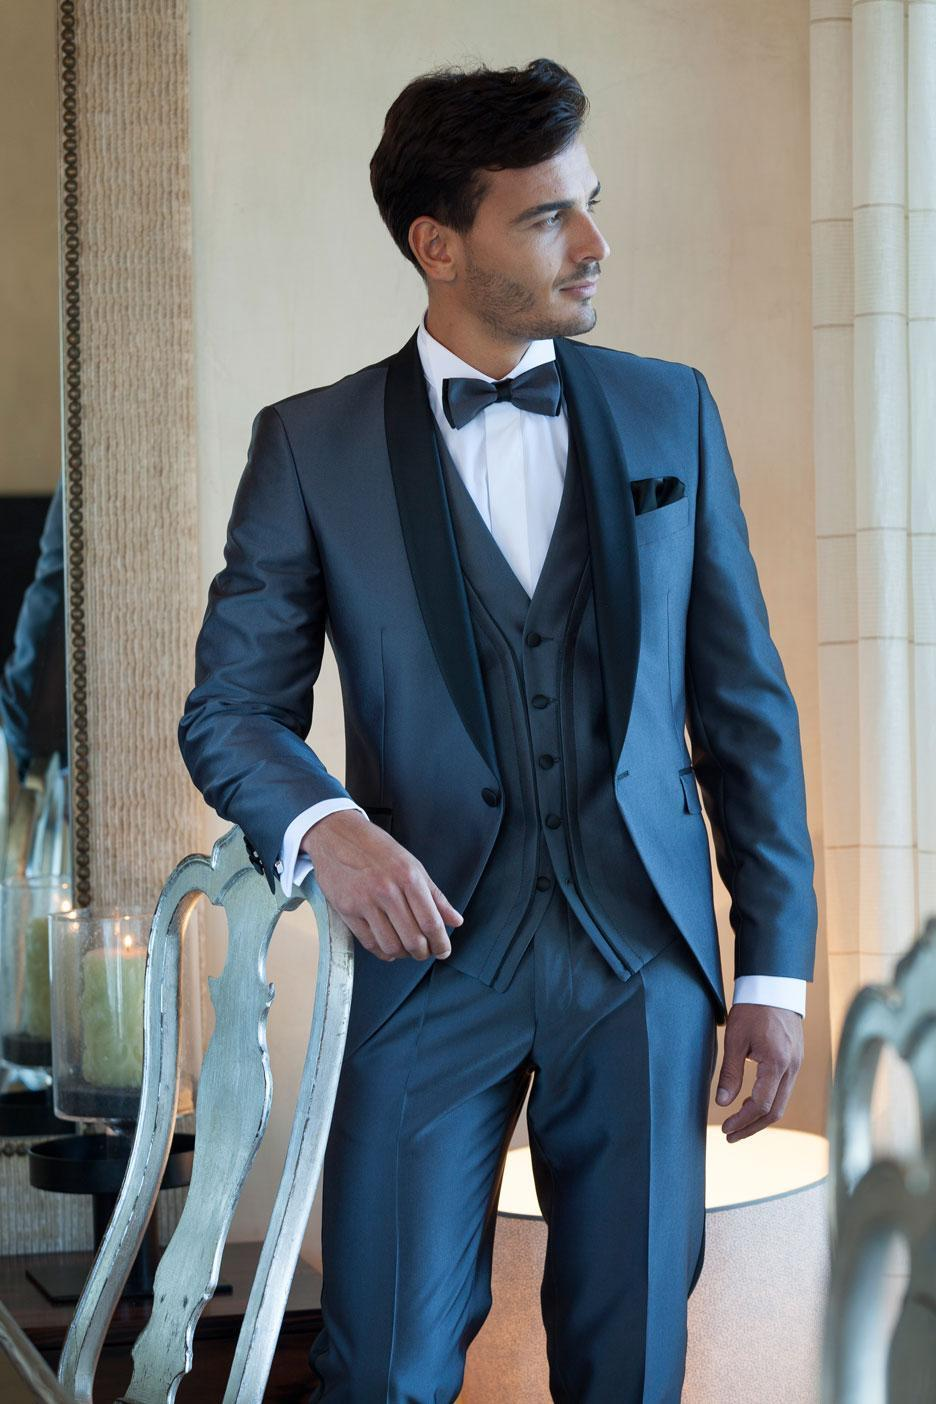 2015 Slim Fit Groom Tuexedos Custom Made Shawl Lapel Groomsmen Men Wedding Suits Prom Tuxedos ( Jacket+Pants+Vest+Tie+Hanky) New Arrival